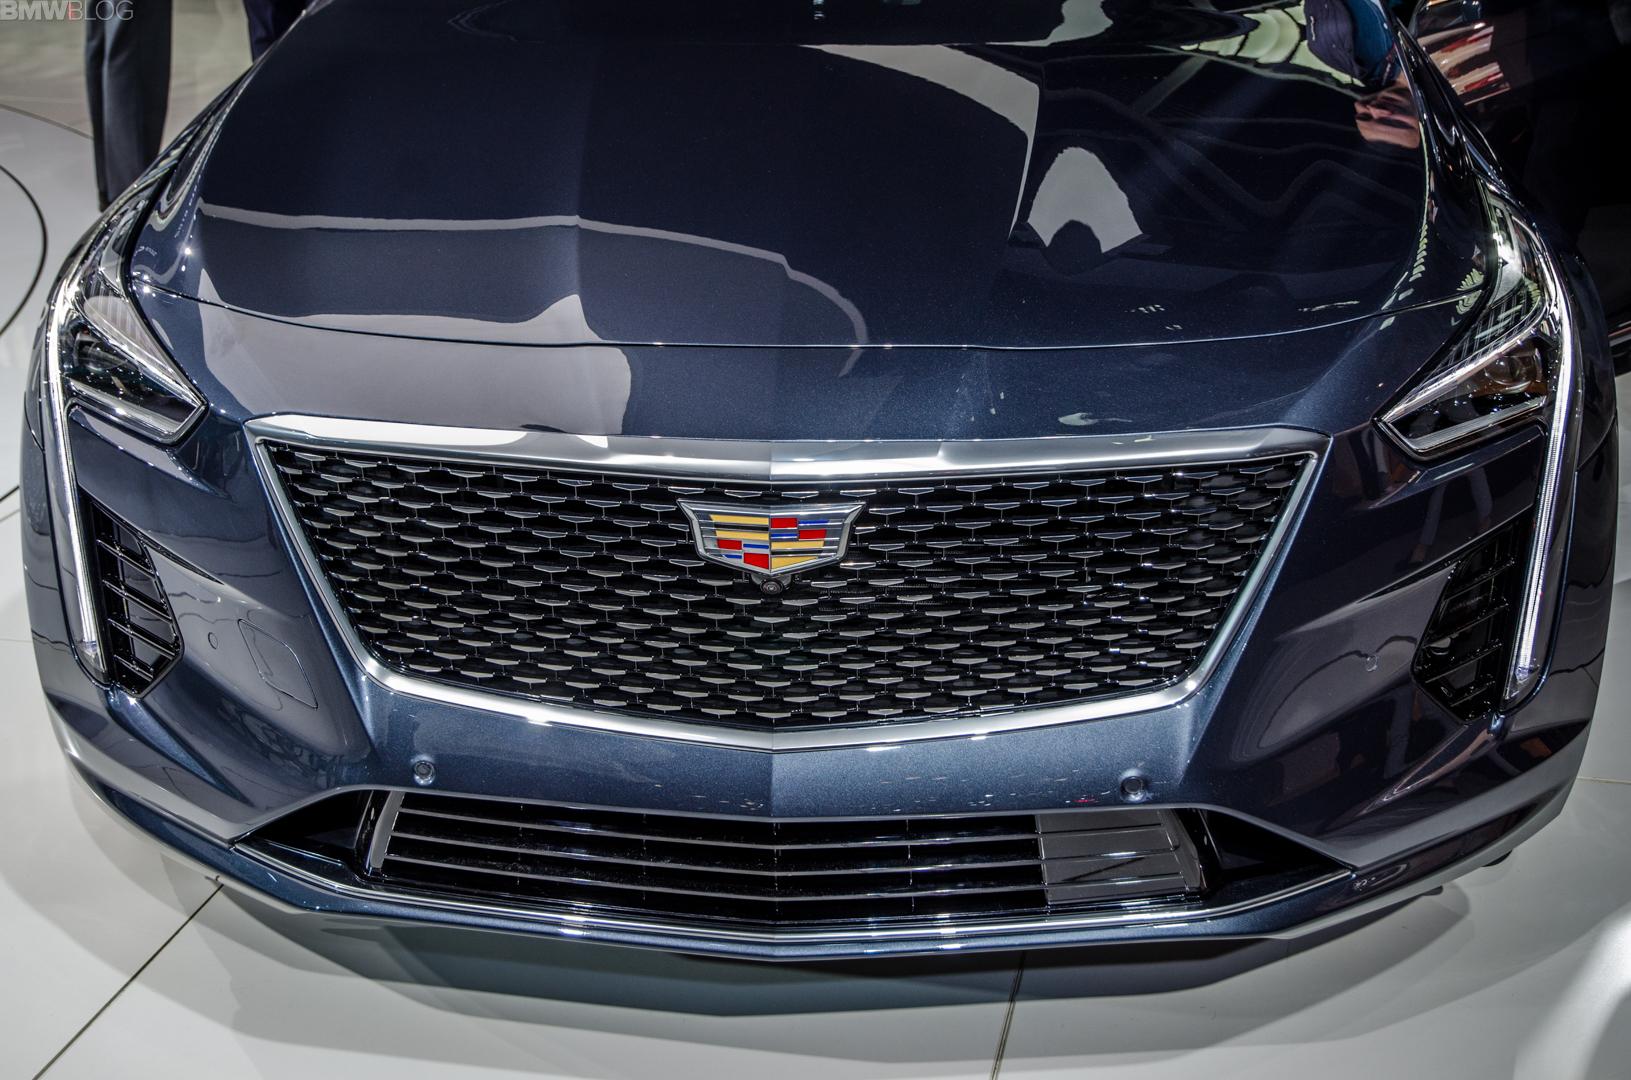 2018 Nyias Cadillac Ct6 V Sport The Debut Of Cadillac